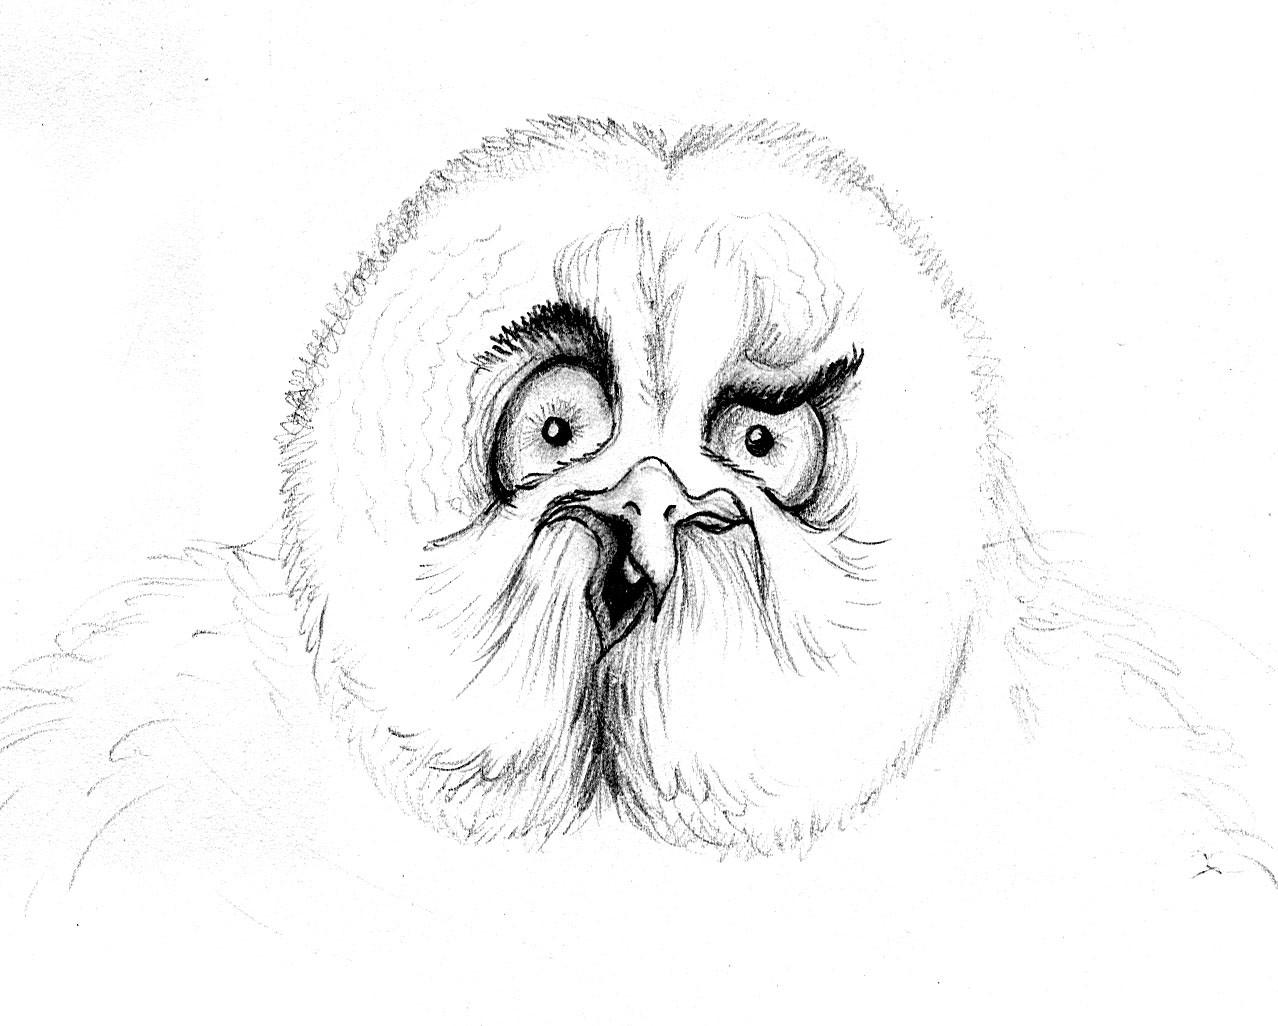 Patricia vasquez de velasco animales bocetos 01b